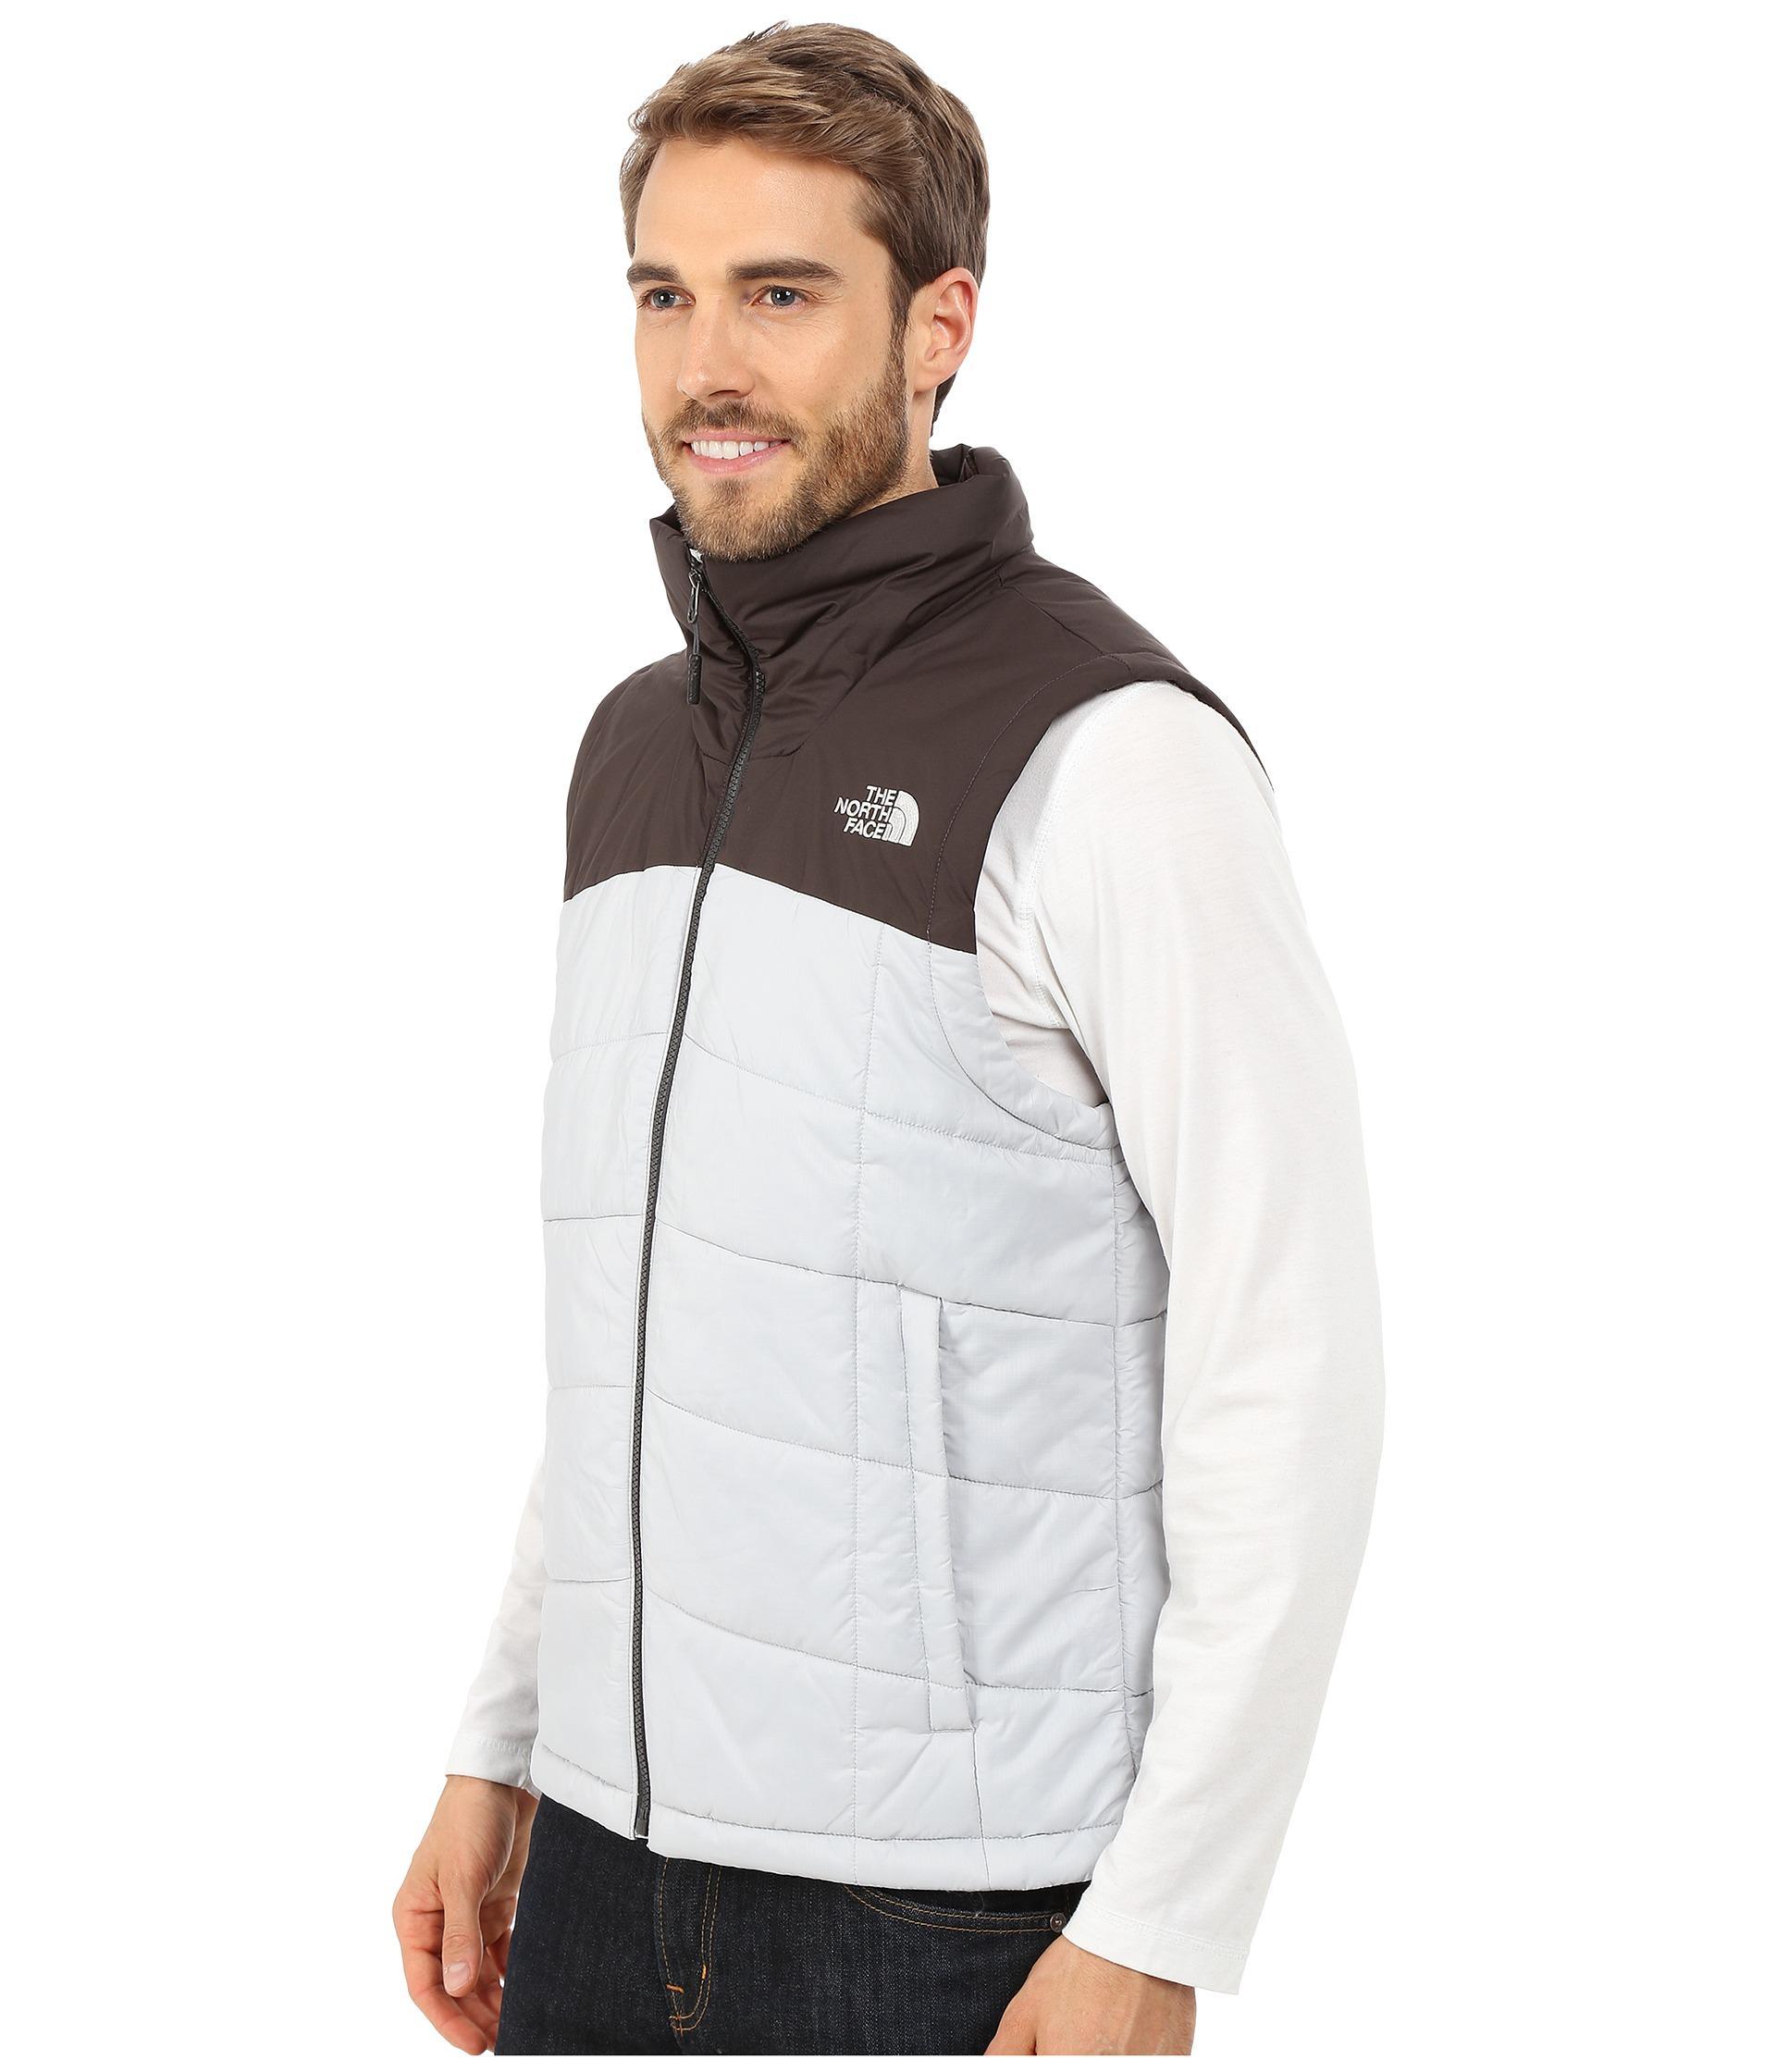 0853191418 Lyst - The North Face Roamer Vest in Gray for Men